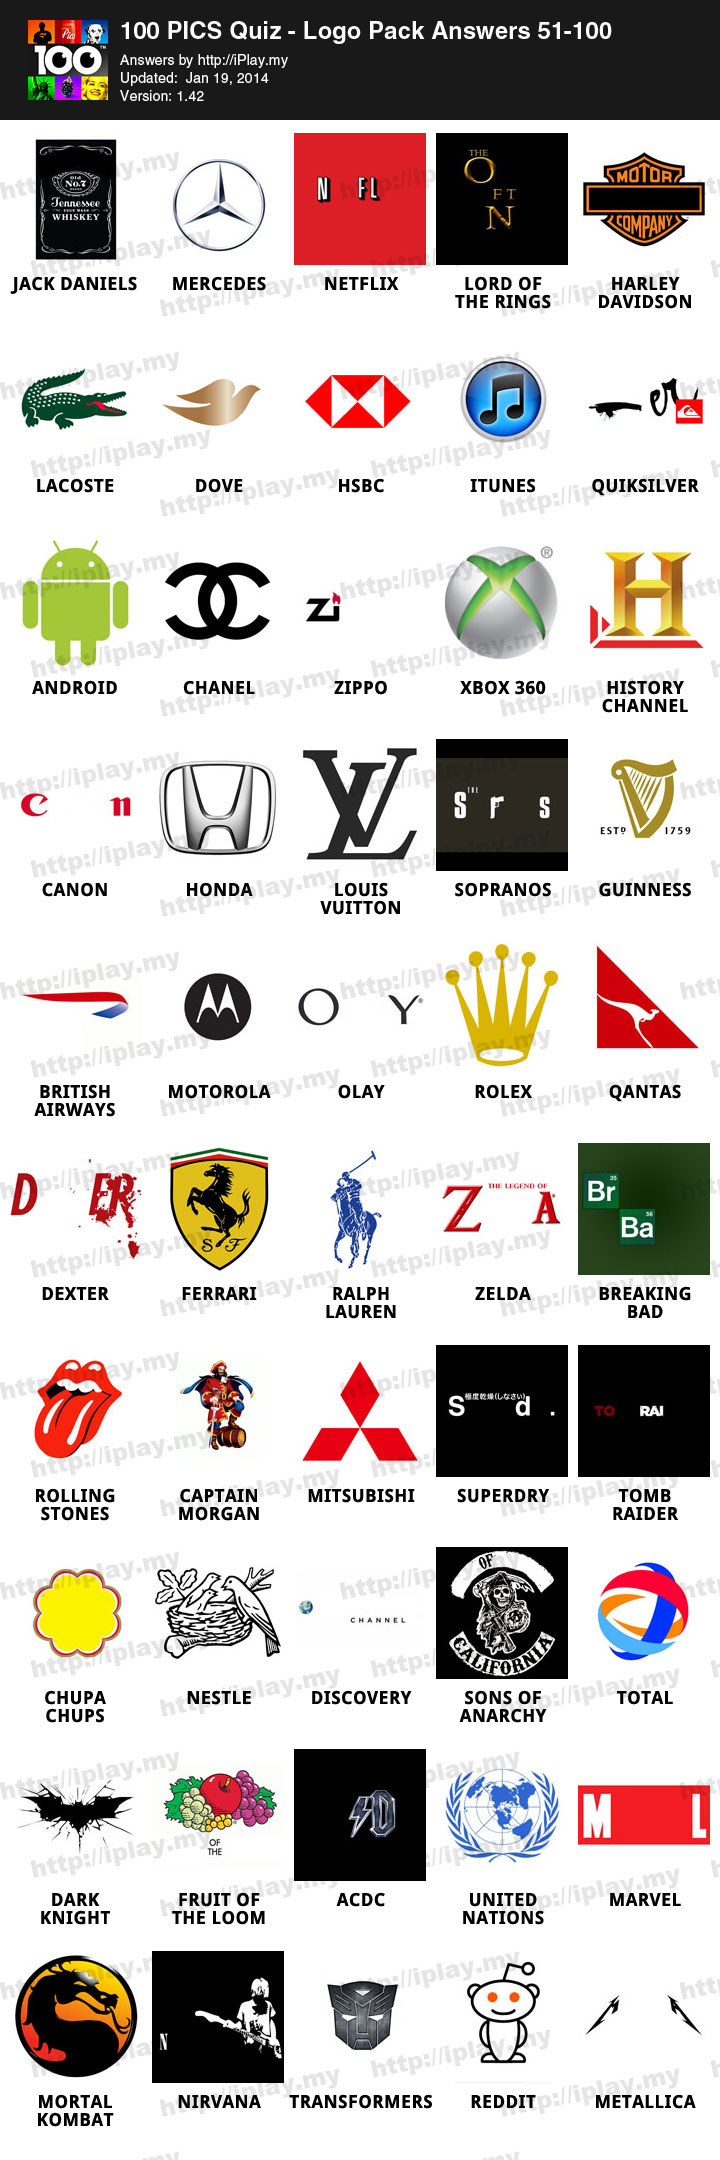 100 PICS Quiz – Logo Pack Answers | iPlay my